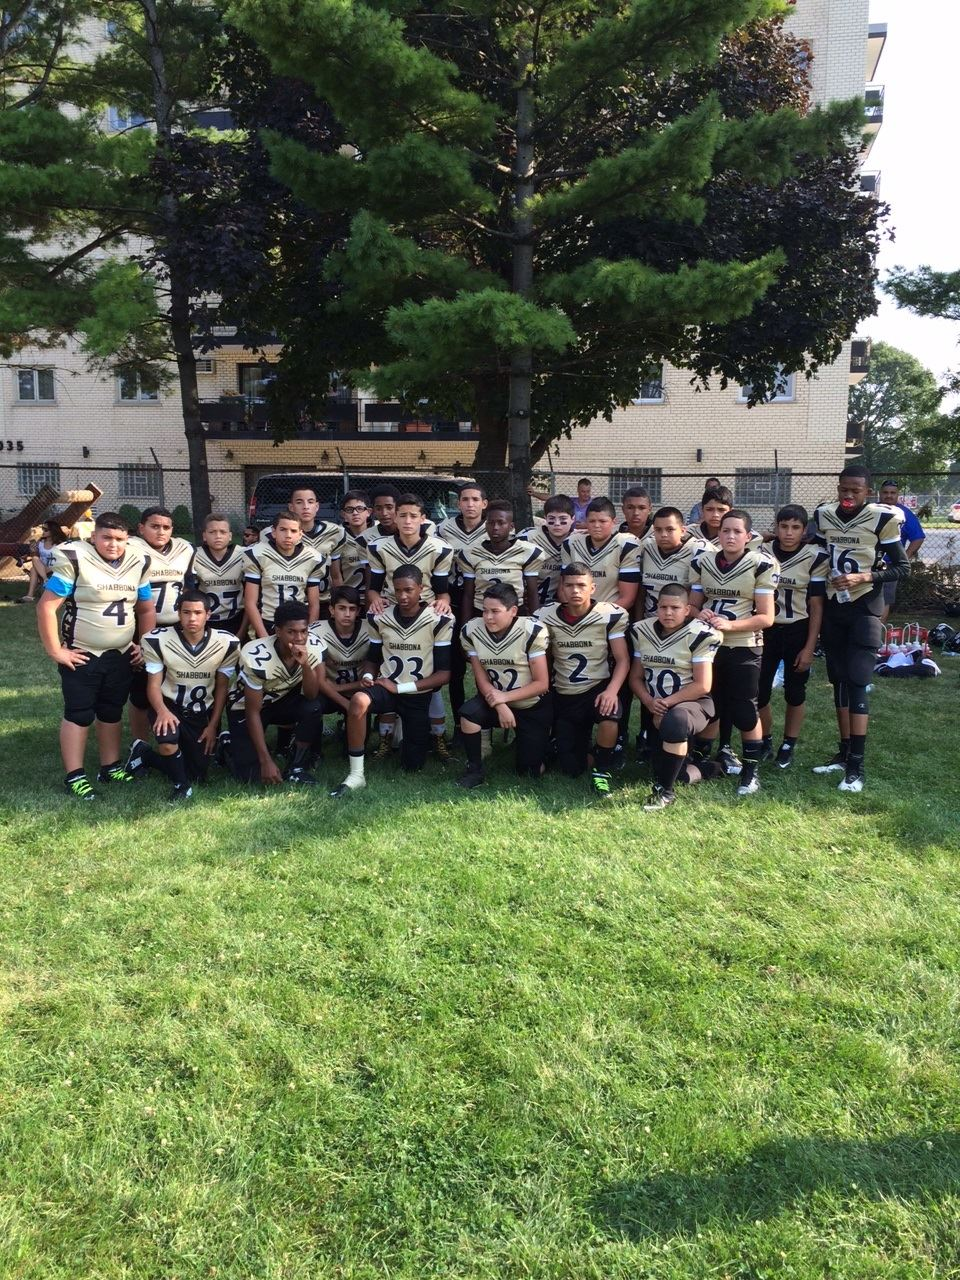 Shabbona Saints- GCUYFL - Shabbona Saints Jr. Midgets